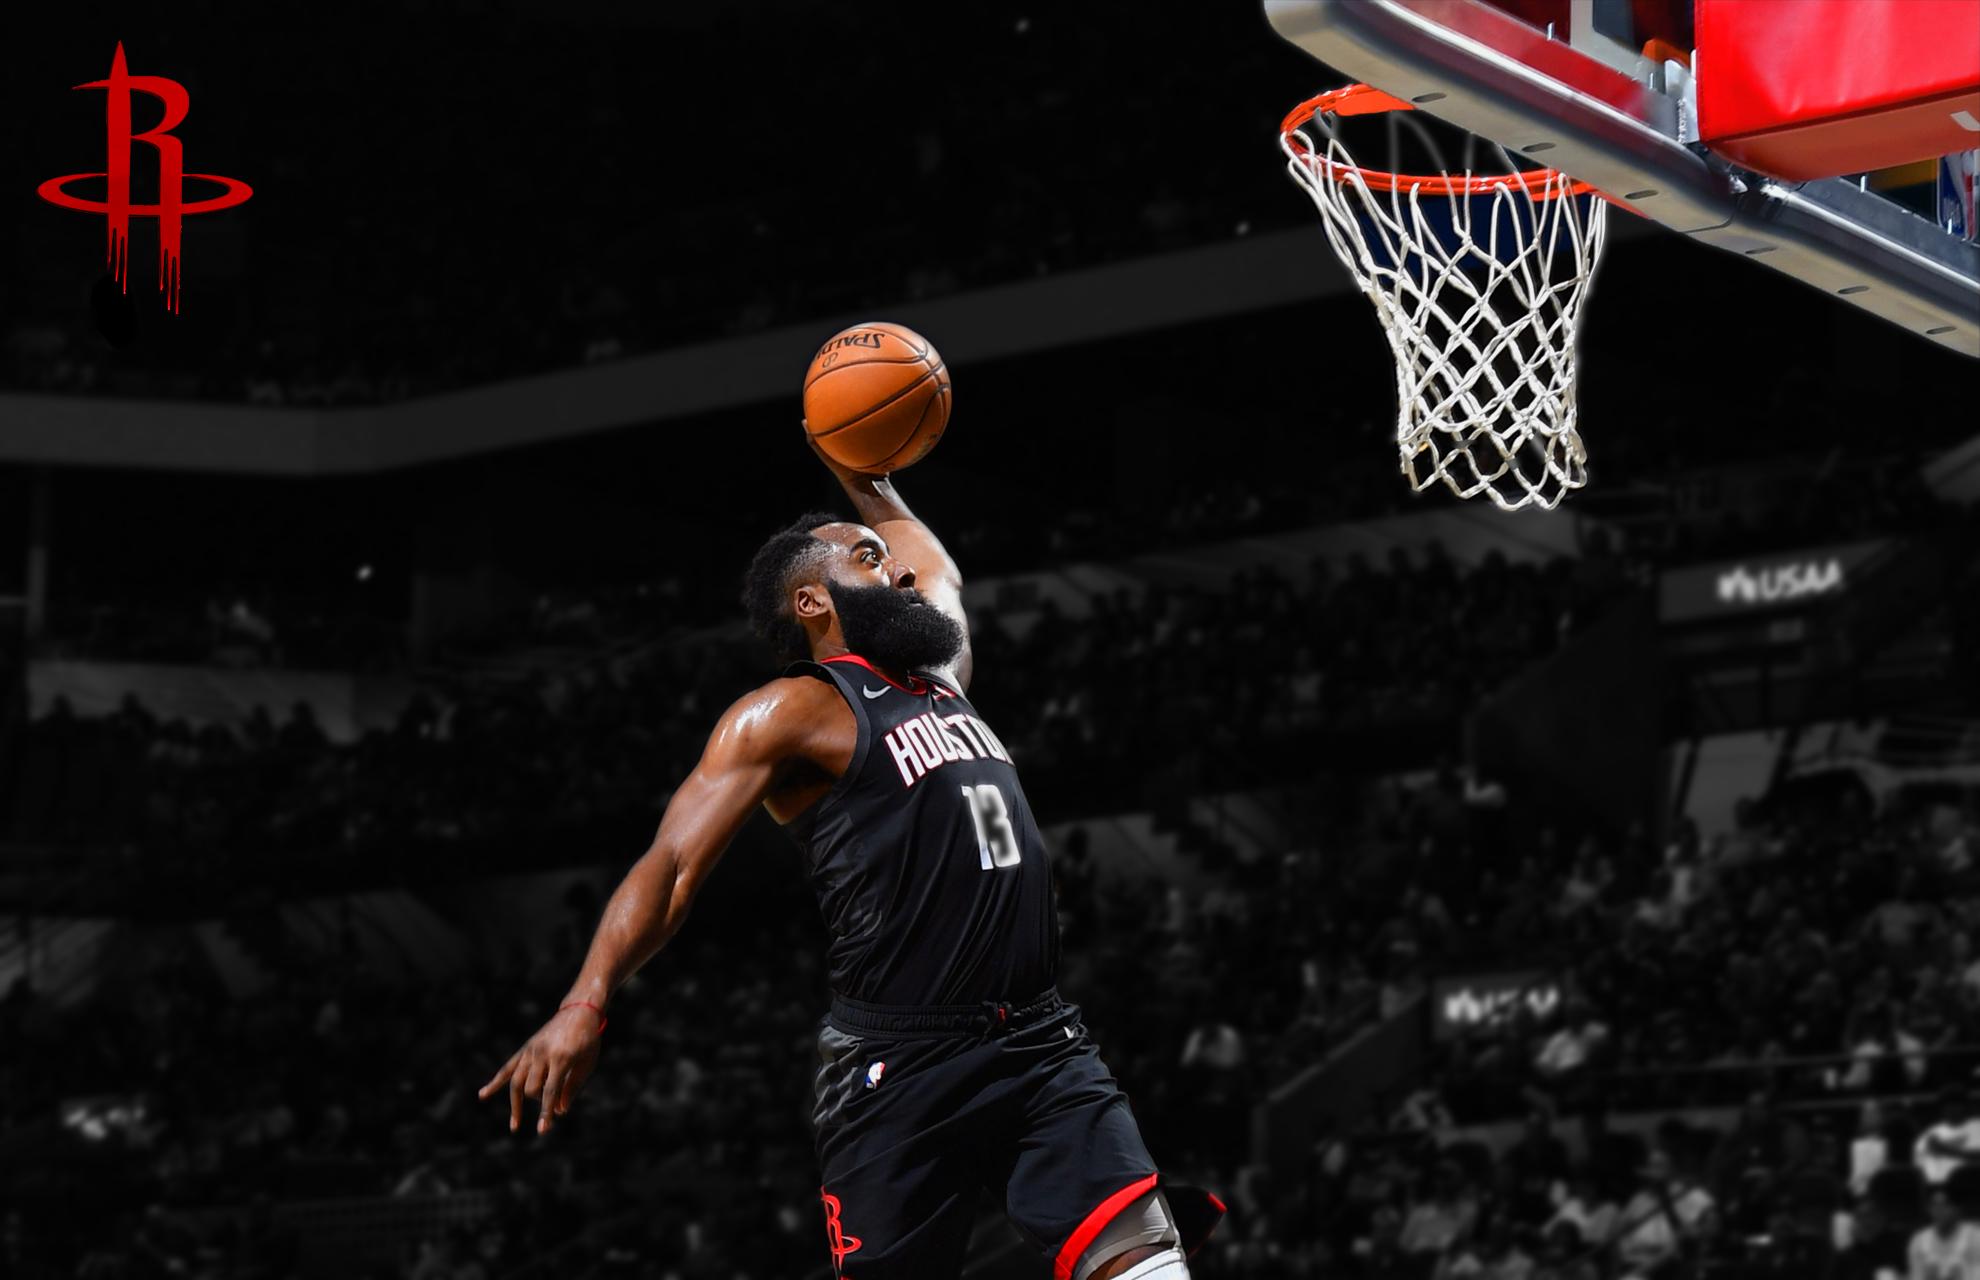 People 1980x1280 James Harden NBA Houston Rockets  dunks basketball people sport  sports beard balls men